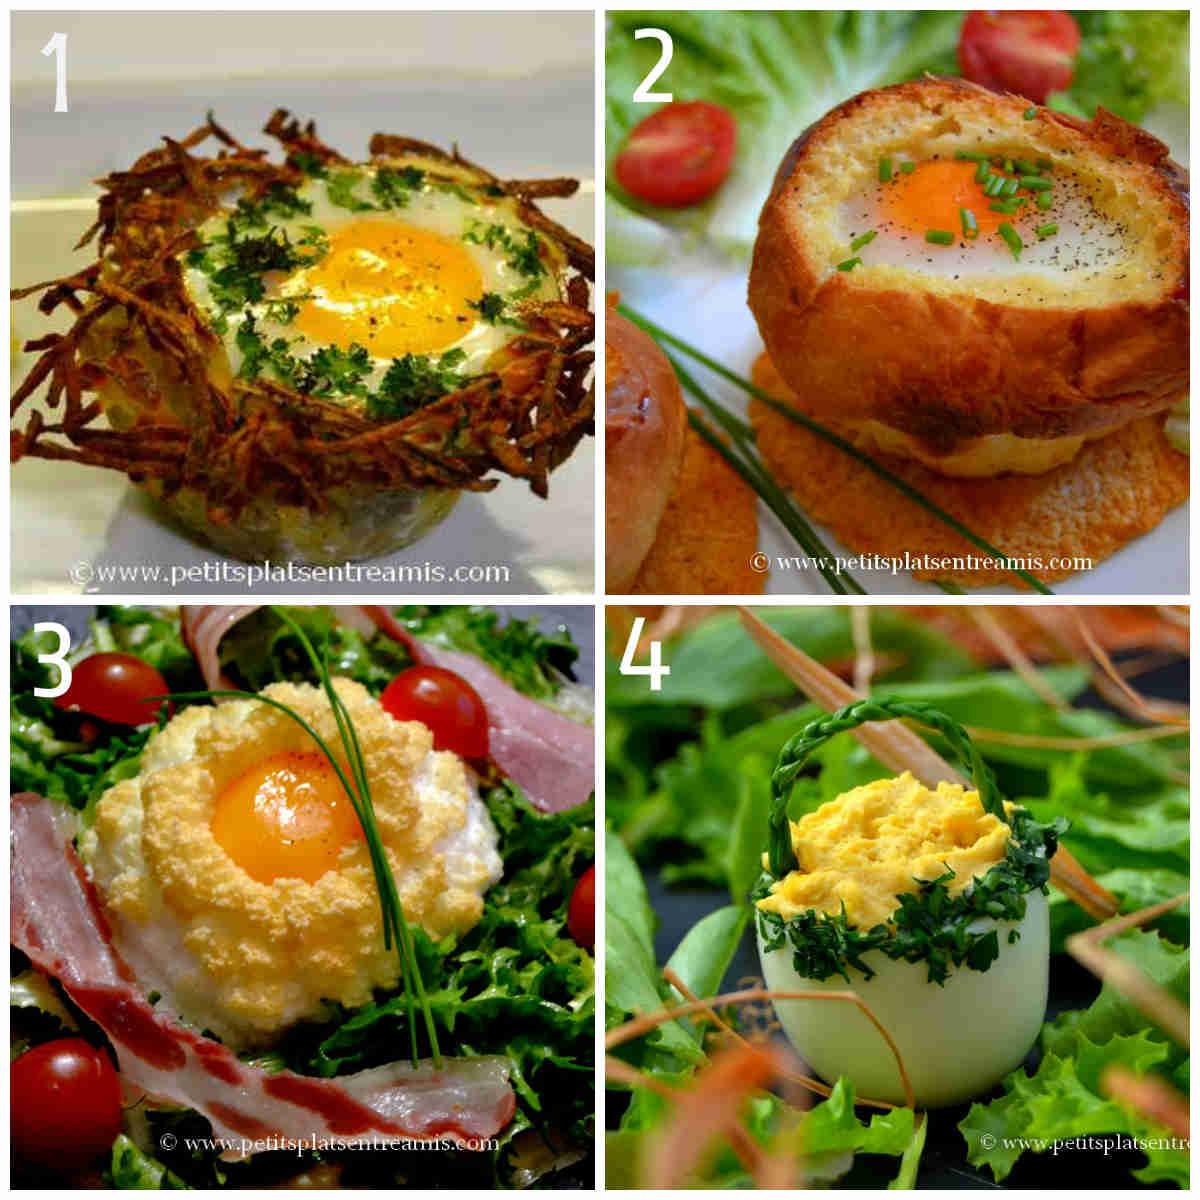 4 recettes d 39 oeufs de p ques en entr e petits plats for Entree sympa entre amis